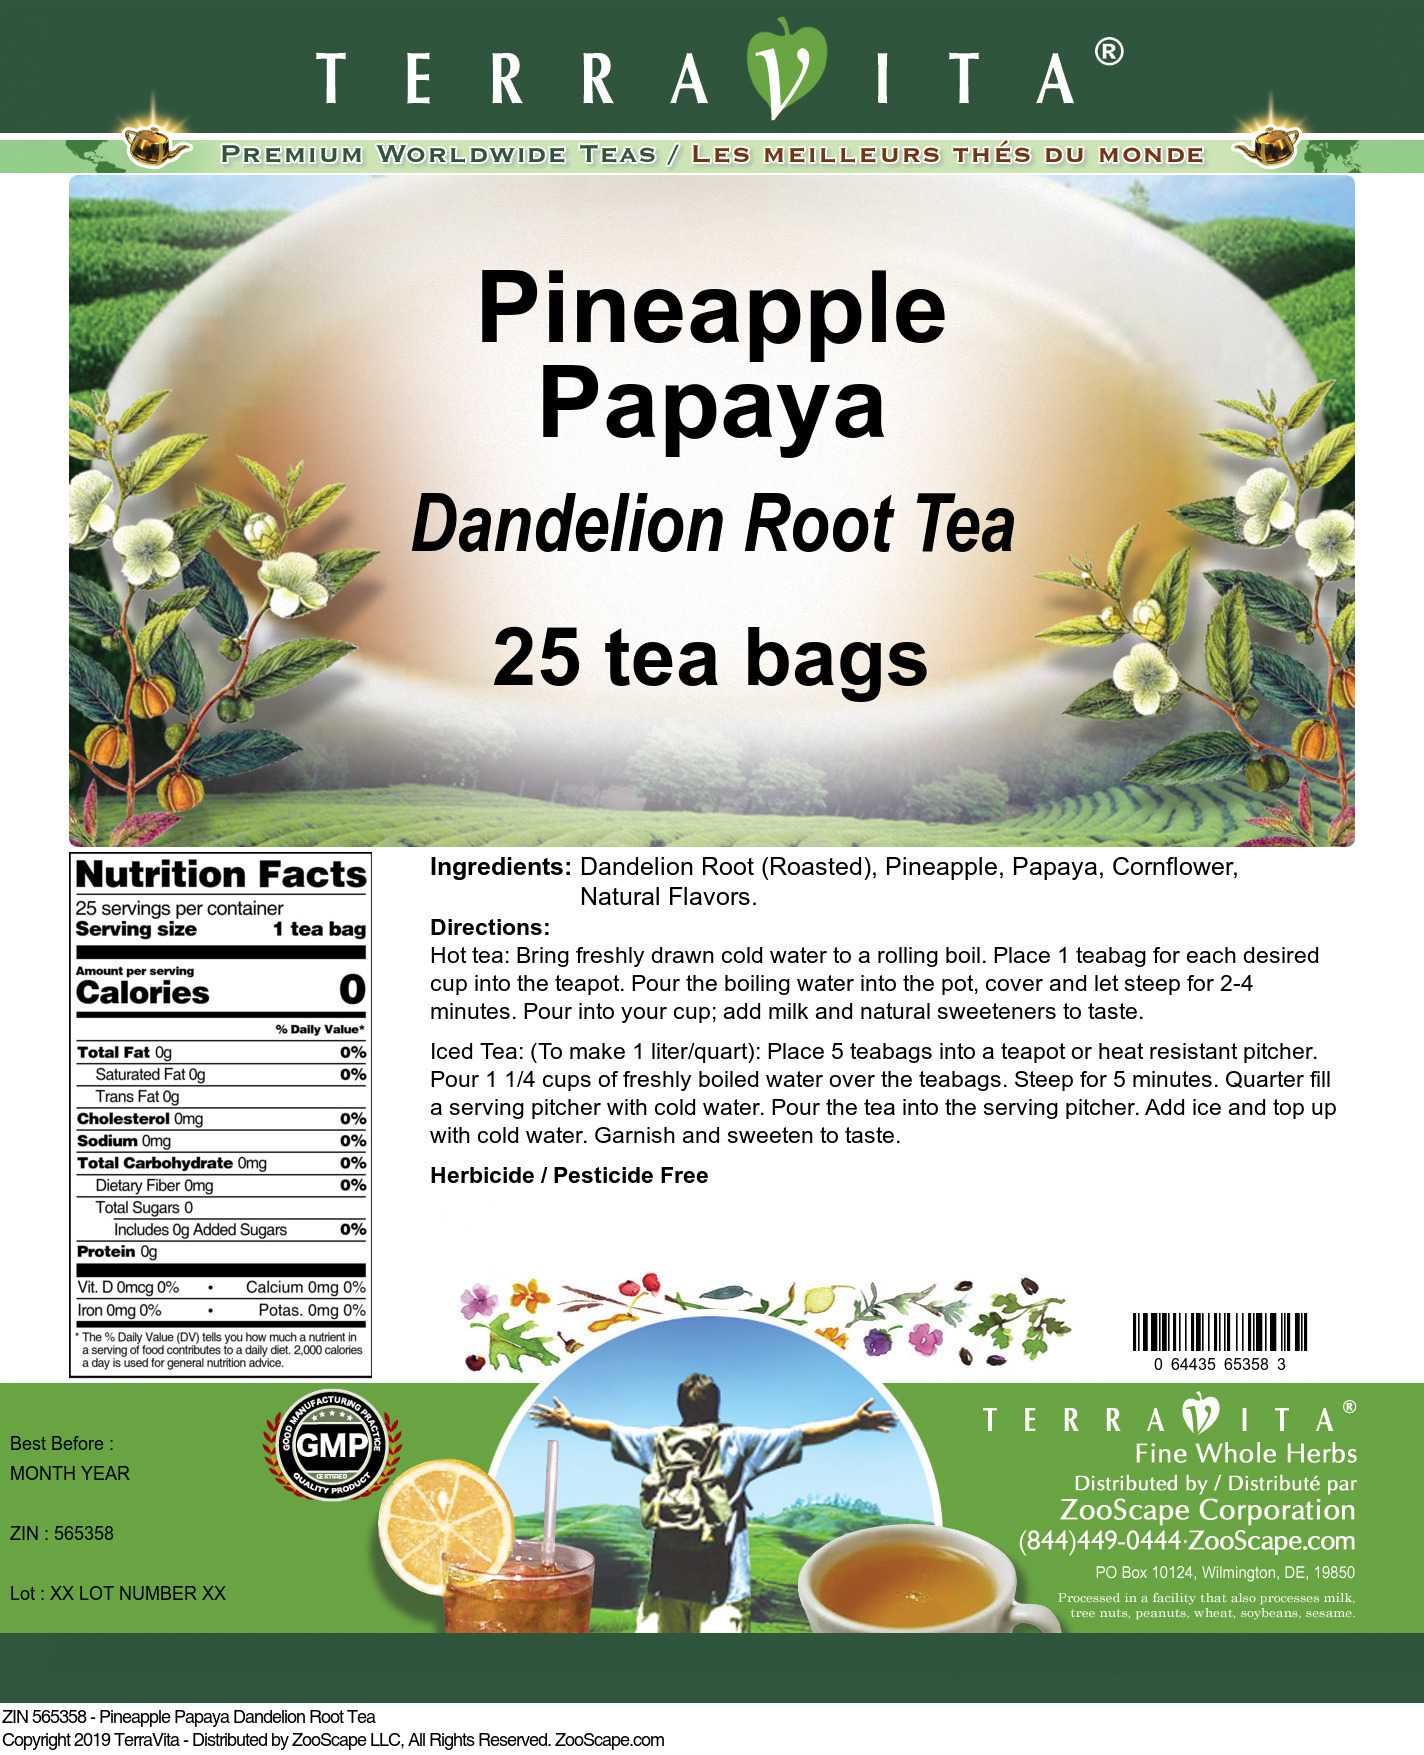 Pineapple Papaya Dandelion Root Tea